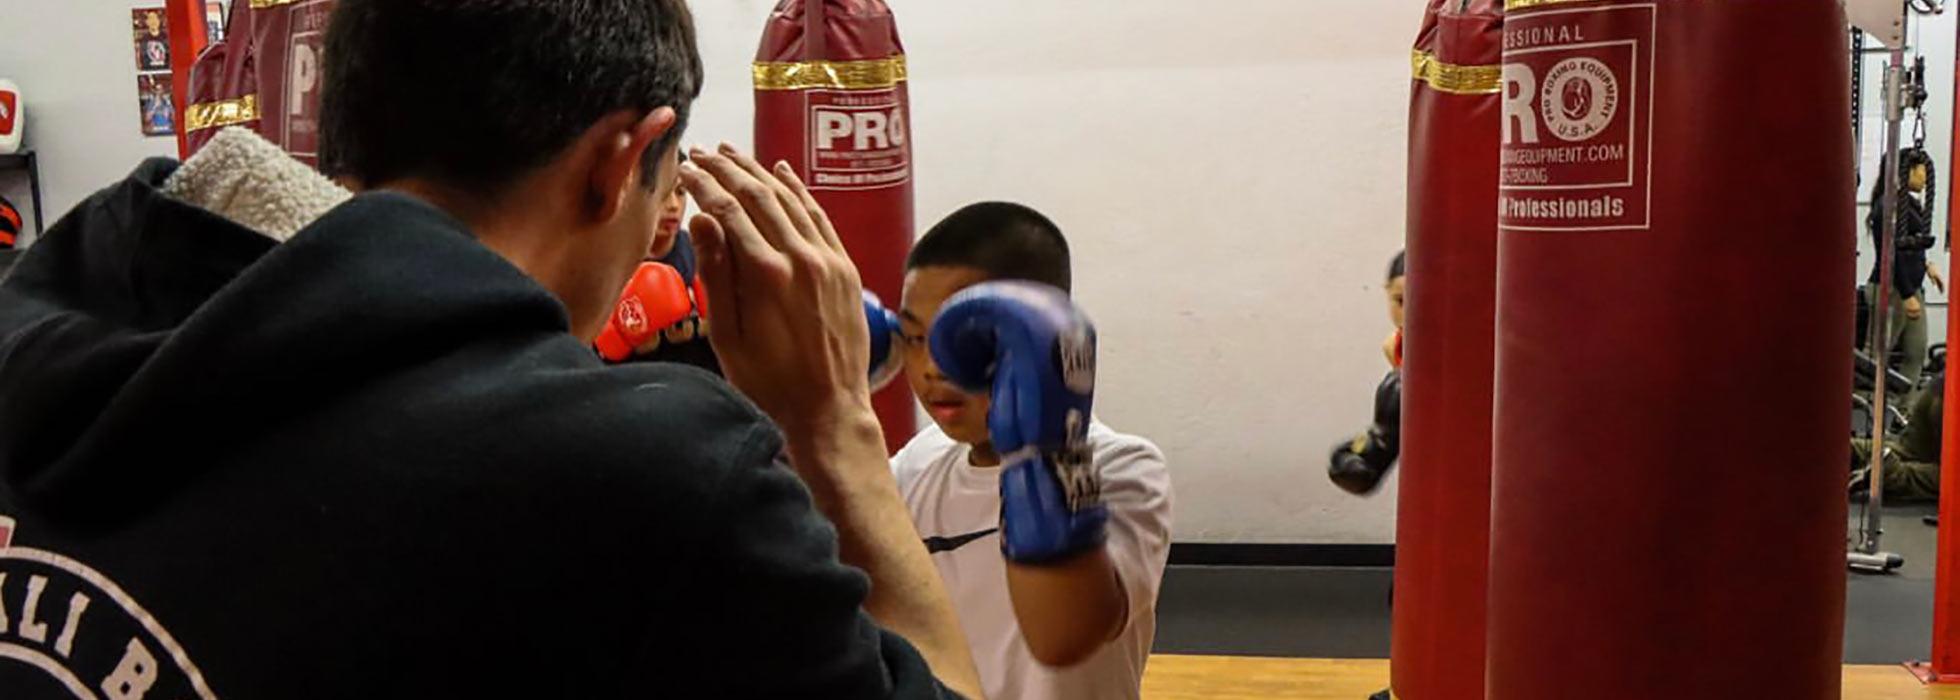 Private Fitness Training in San Jose CA, Private Fitness Training near Eastside San Jose CA, Private Fitness Training near Downtown San Jose CA, Private Fitness Training near Milpitas CA